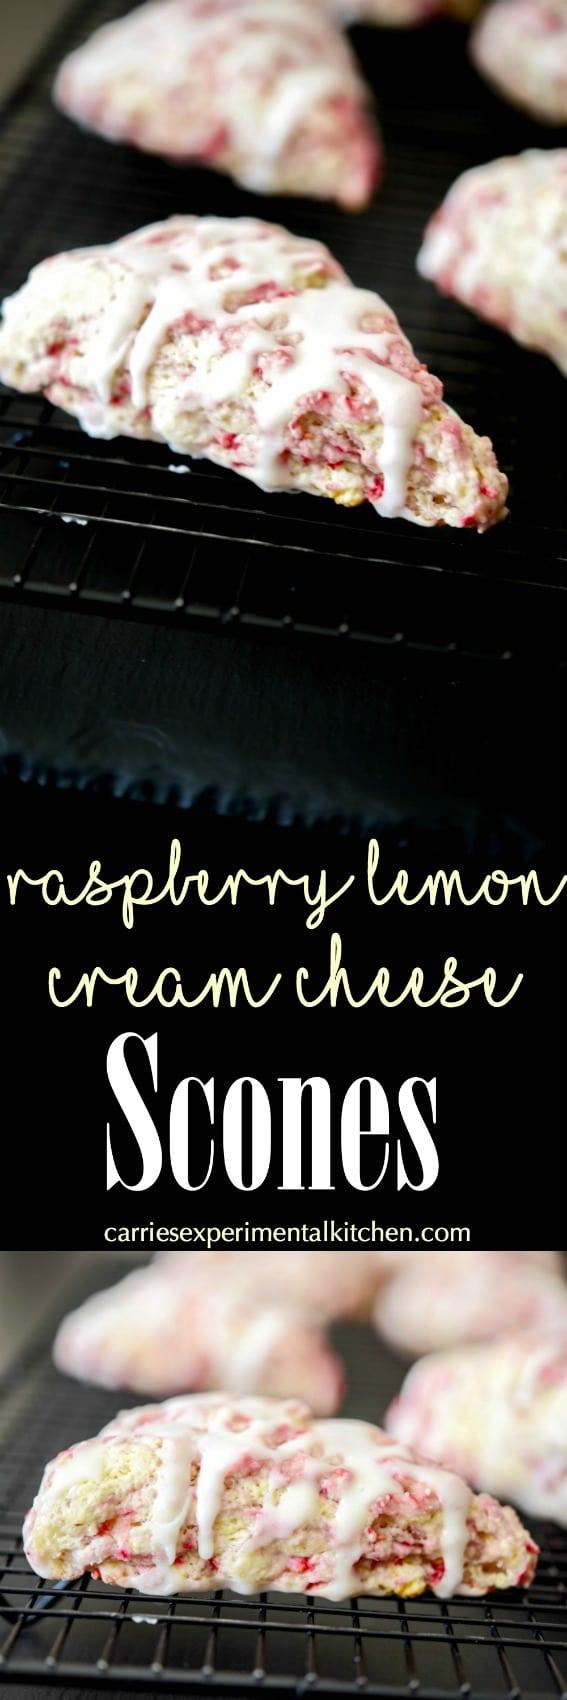 Raspberry Lemon Cream Cheese Scones made with fresh raspberries, lemon zest and cream cheese; then topped with a lemony sugar glaze are deliciously moist.  #scones #raspberries #lemon #breakfast #dessert